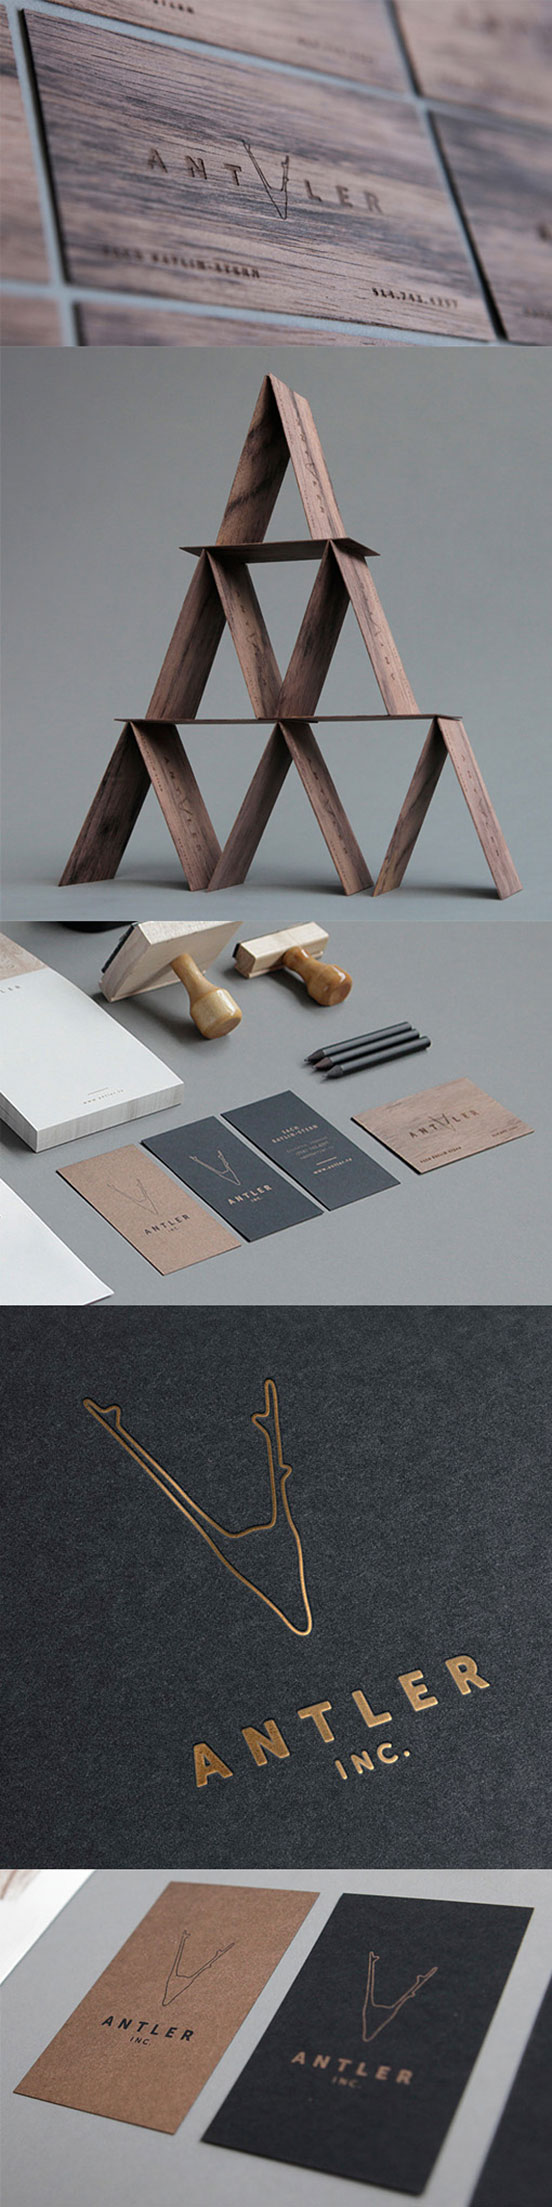 Premium Laser Cut Wooden Business Cards